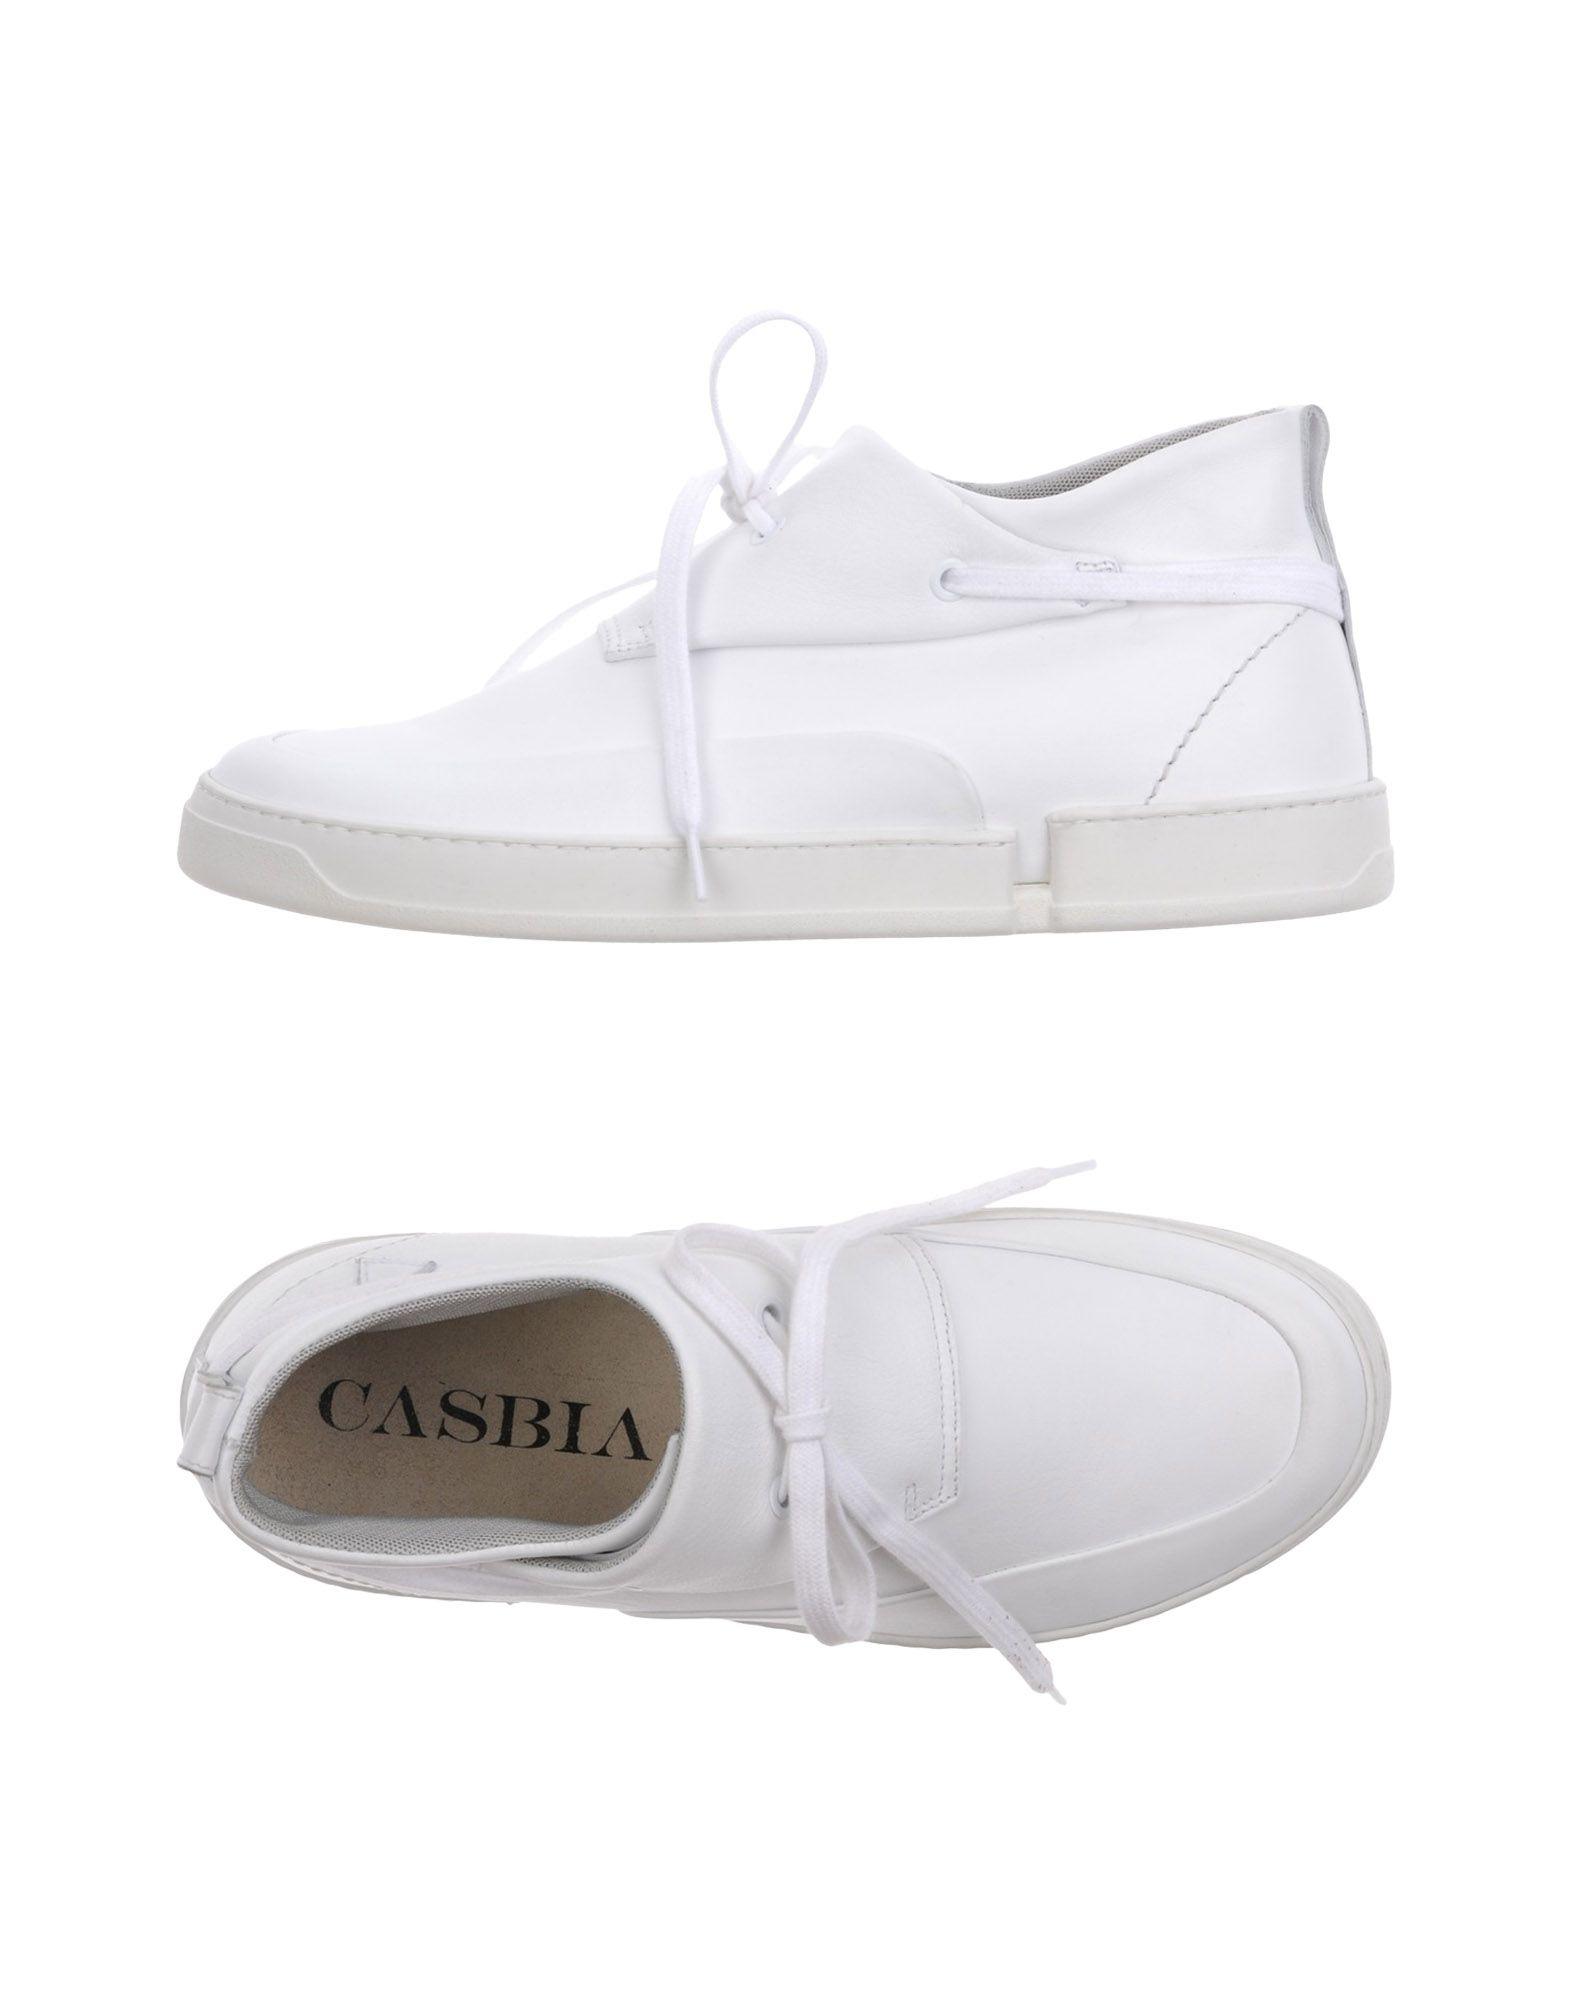 CASBIA Высокие кеды и кроссовки кеды кроссовки высокие dc council mid tx stone camo